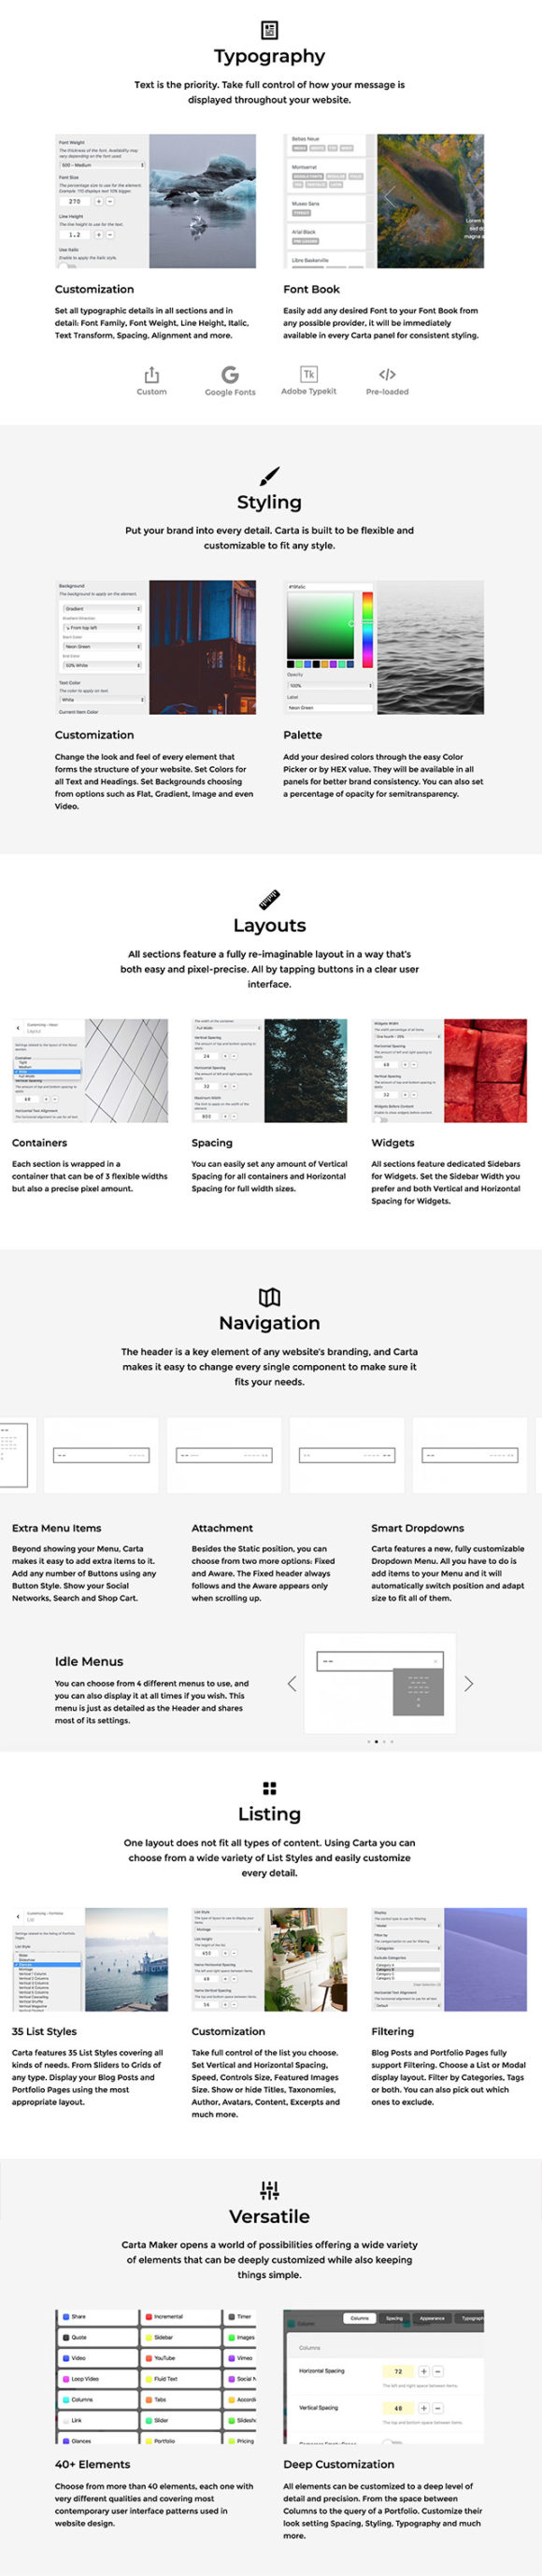 Carta WordPress theme (.PHP + .CSS) скачать бесплатно